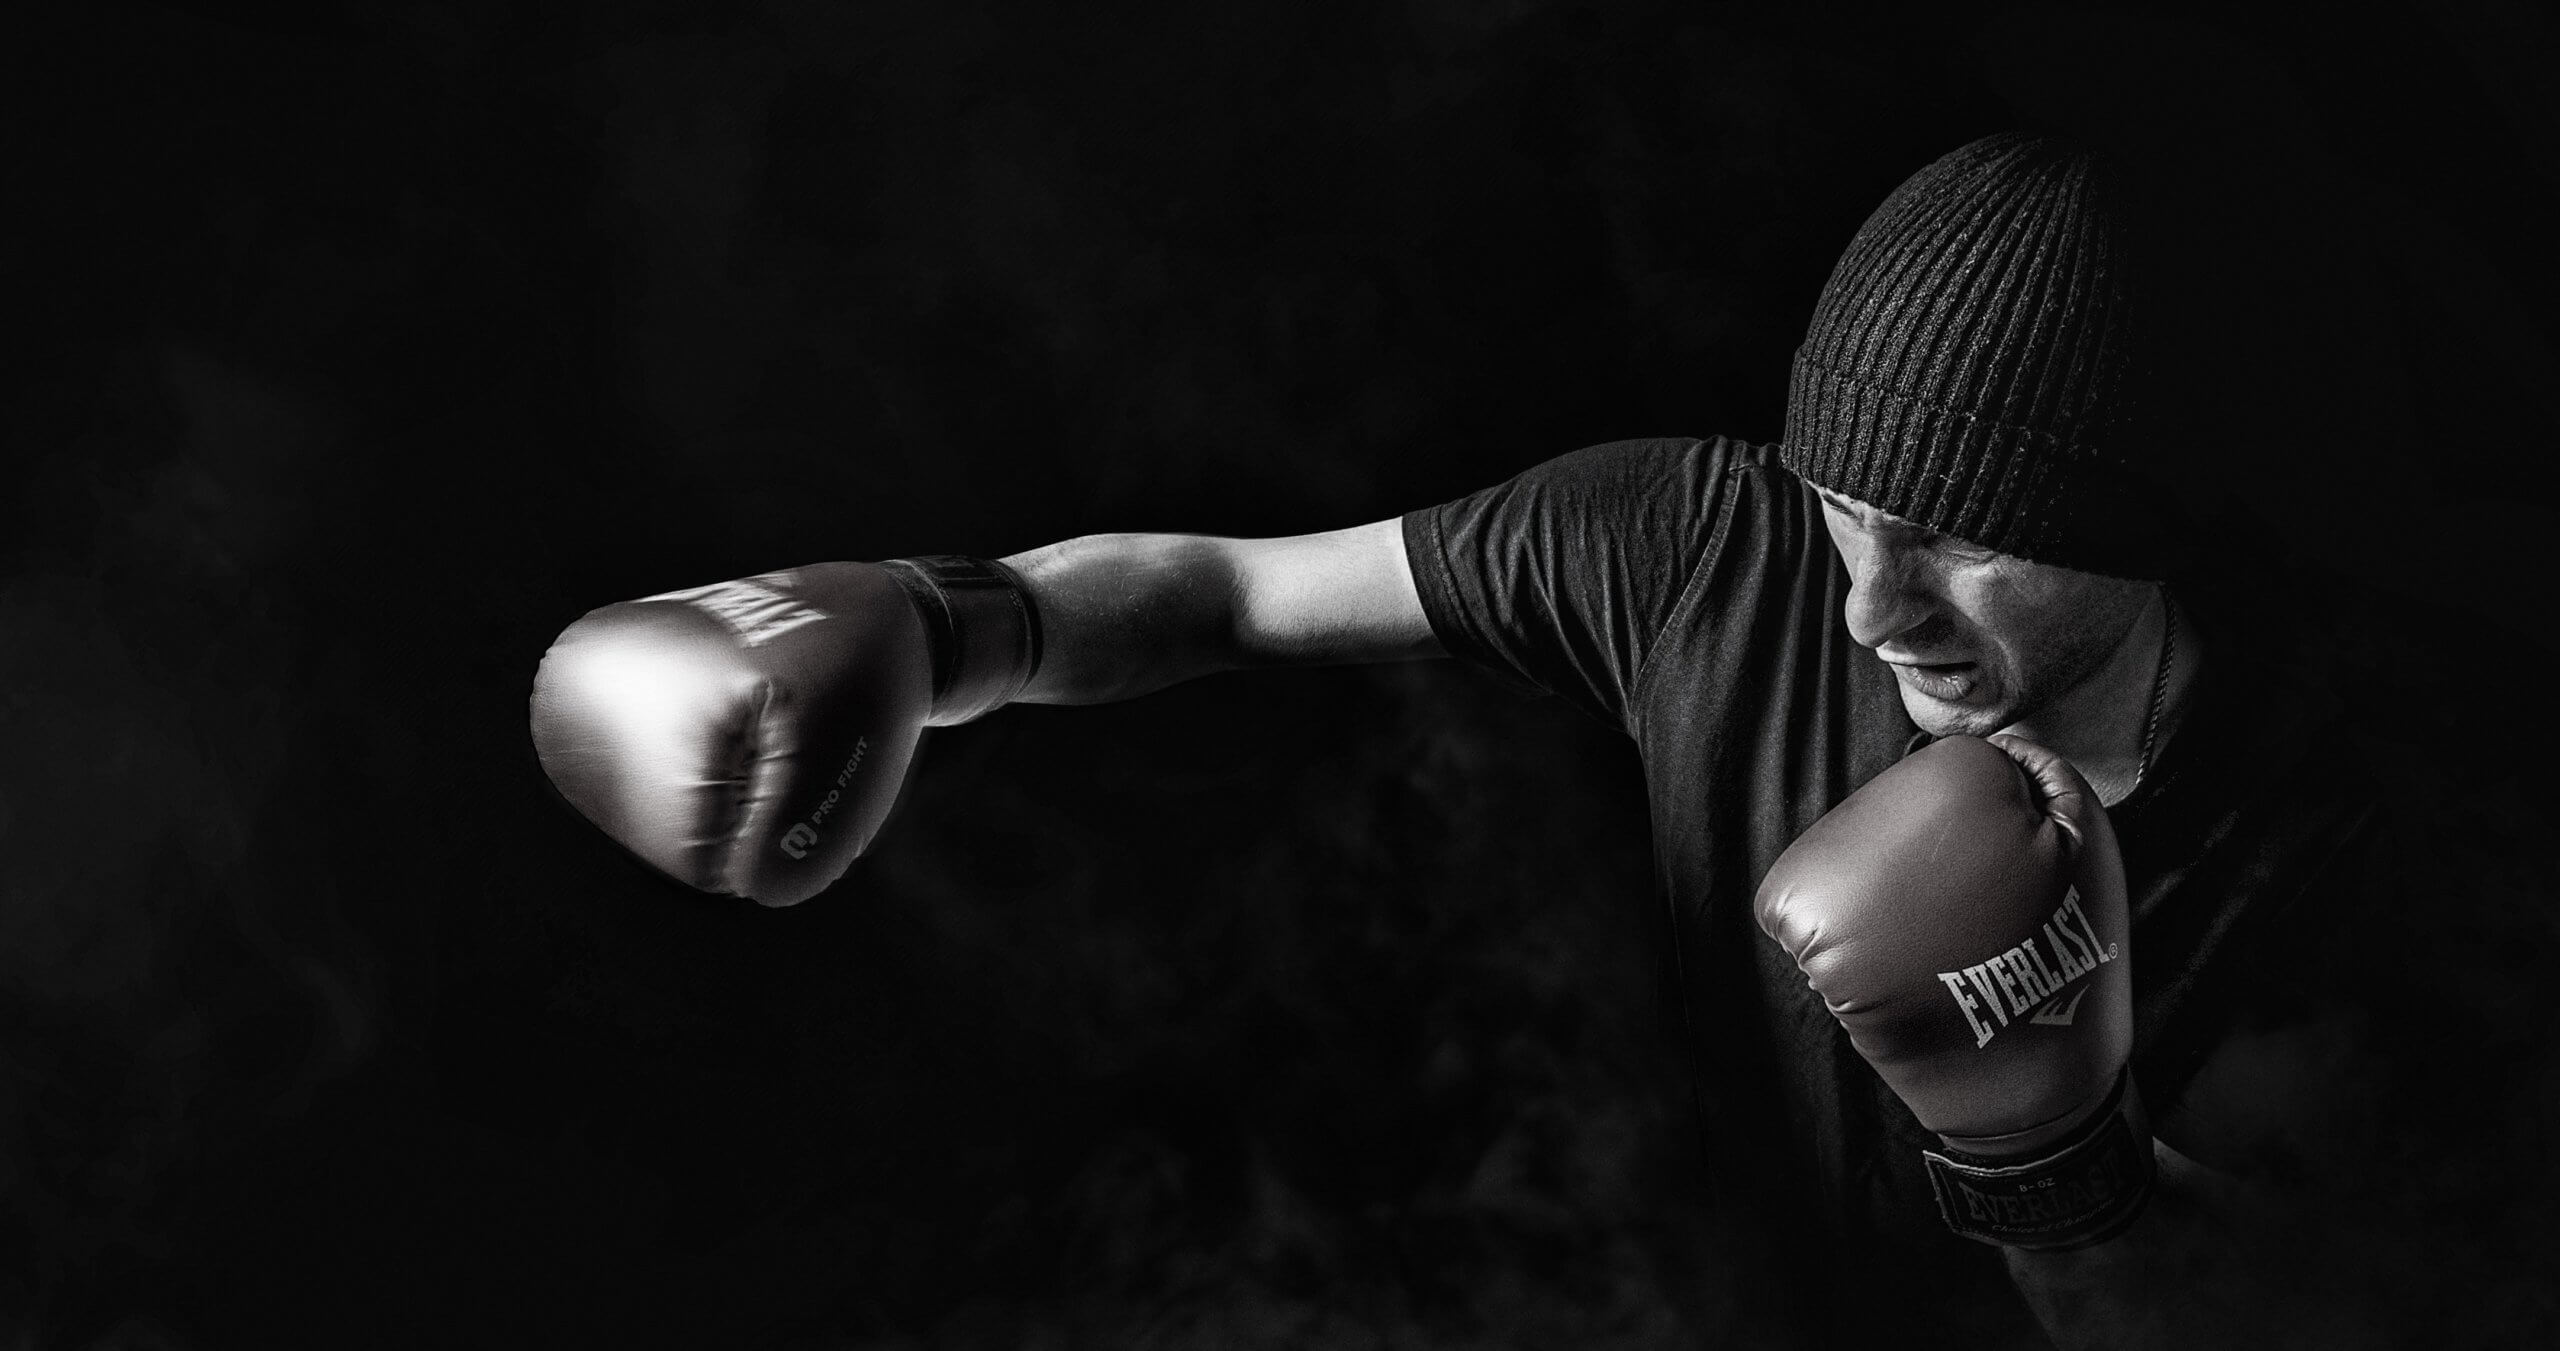 athletausbildungboxenboxerscaled